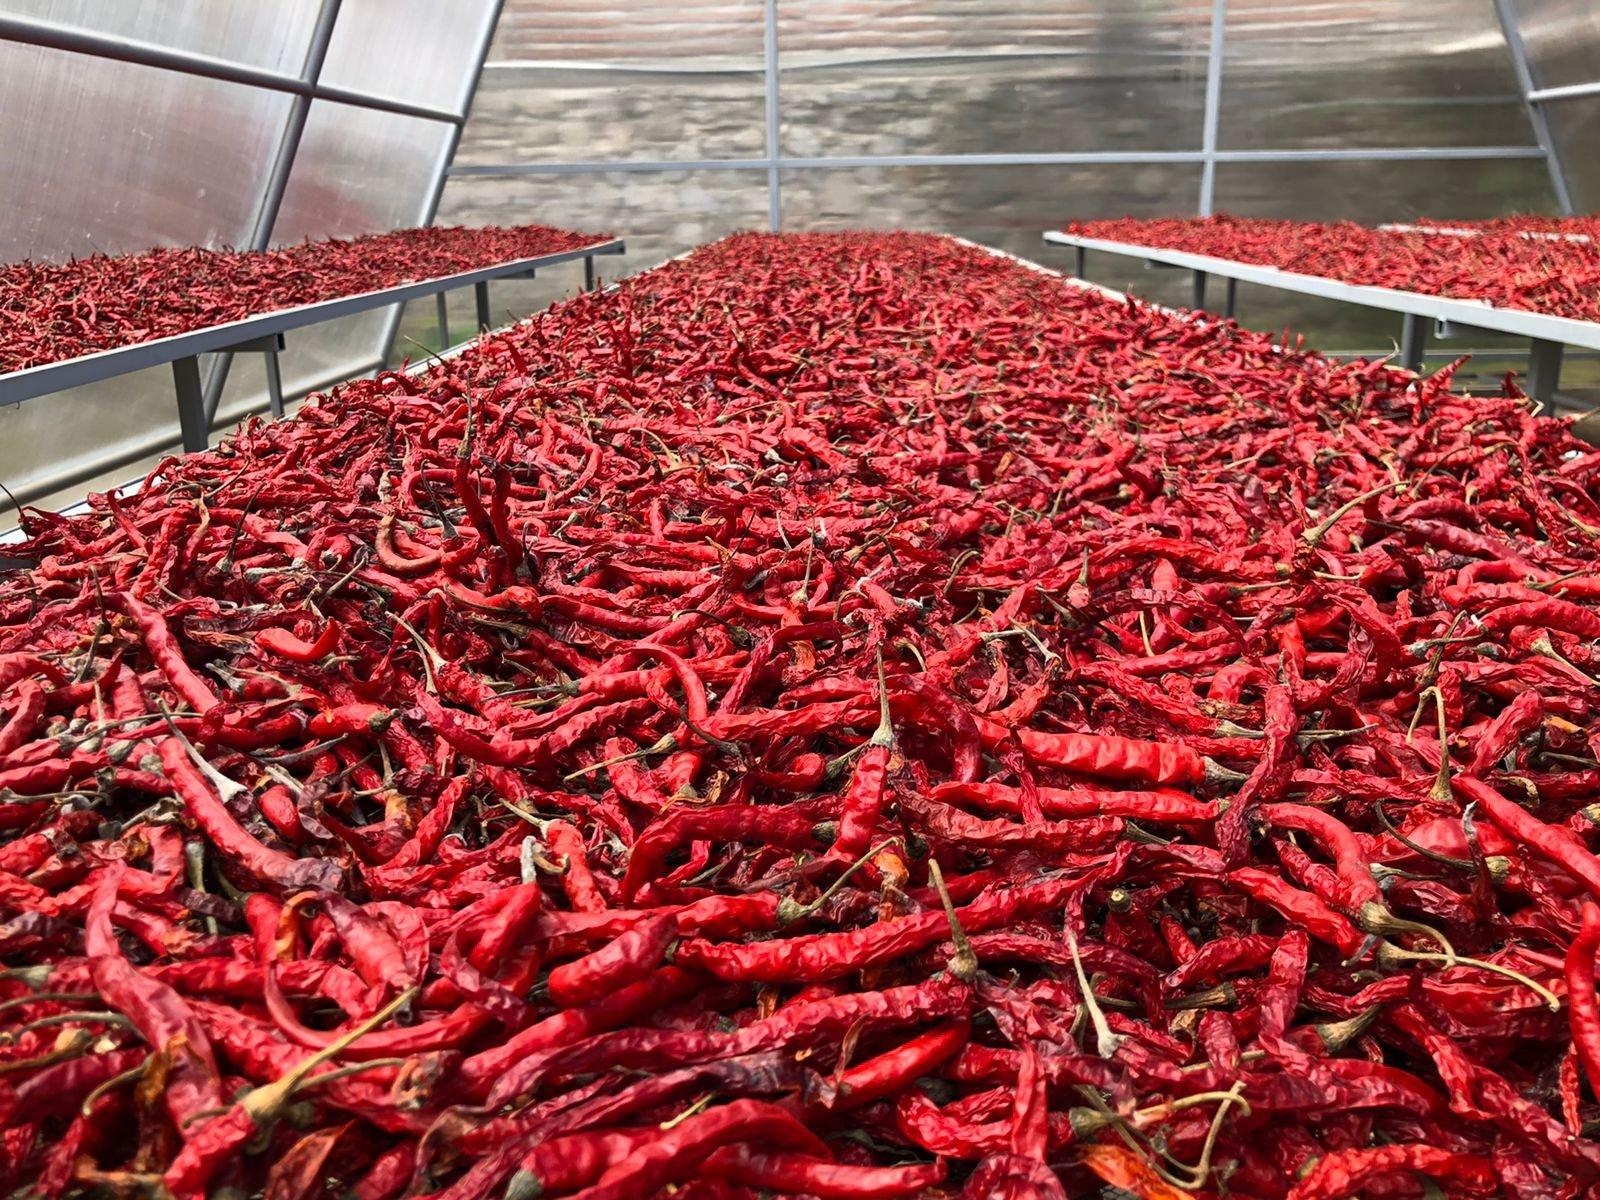 Tingkatkan Produk Hortikultra, Kementan Dukung Industri Pertanian Gunakan Teknologi Ini - JPNN.com